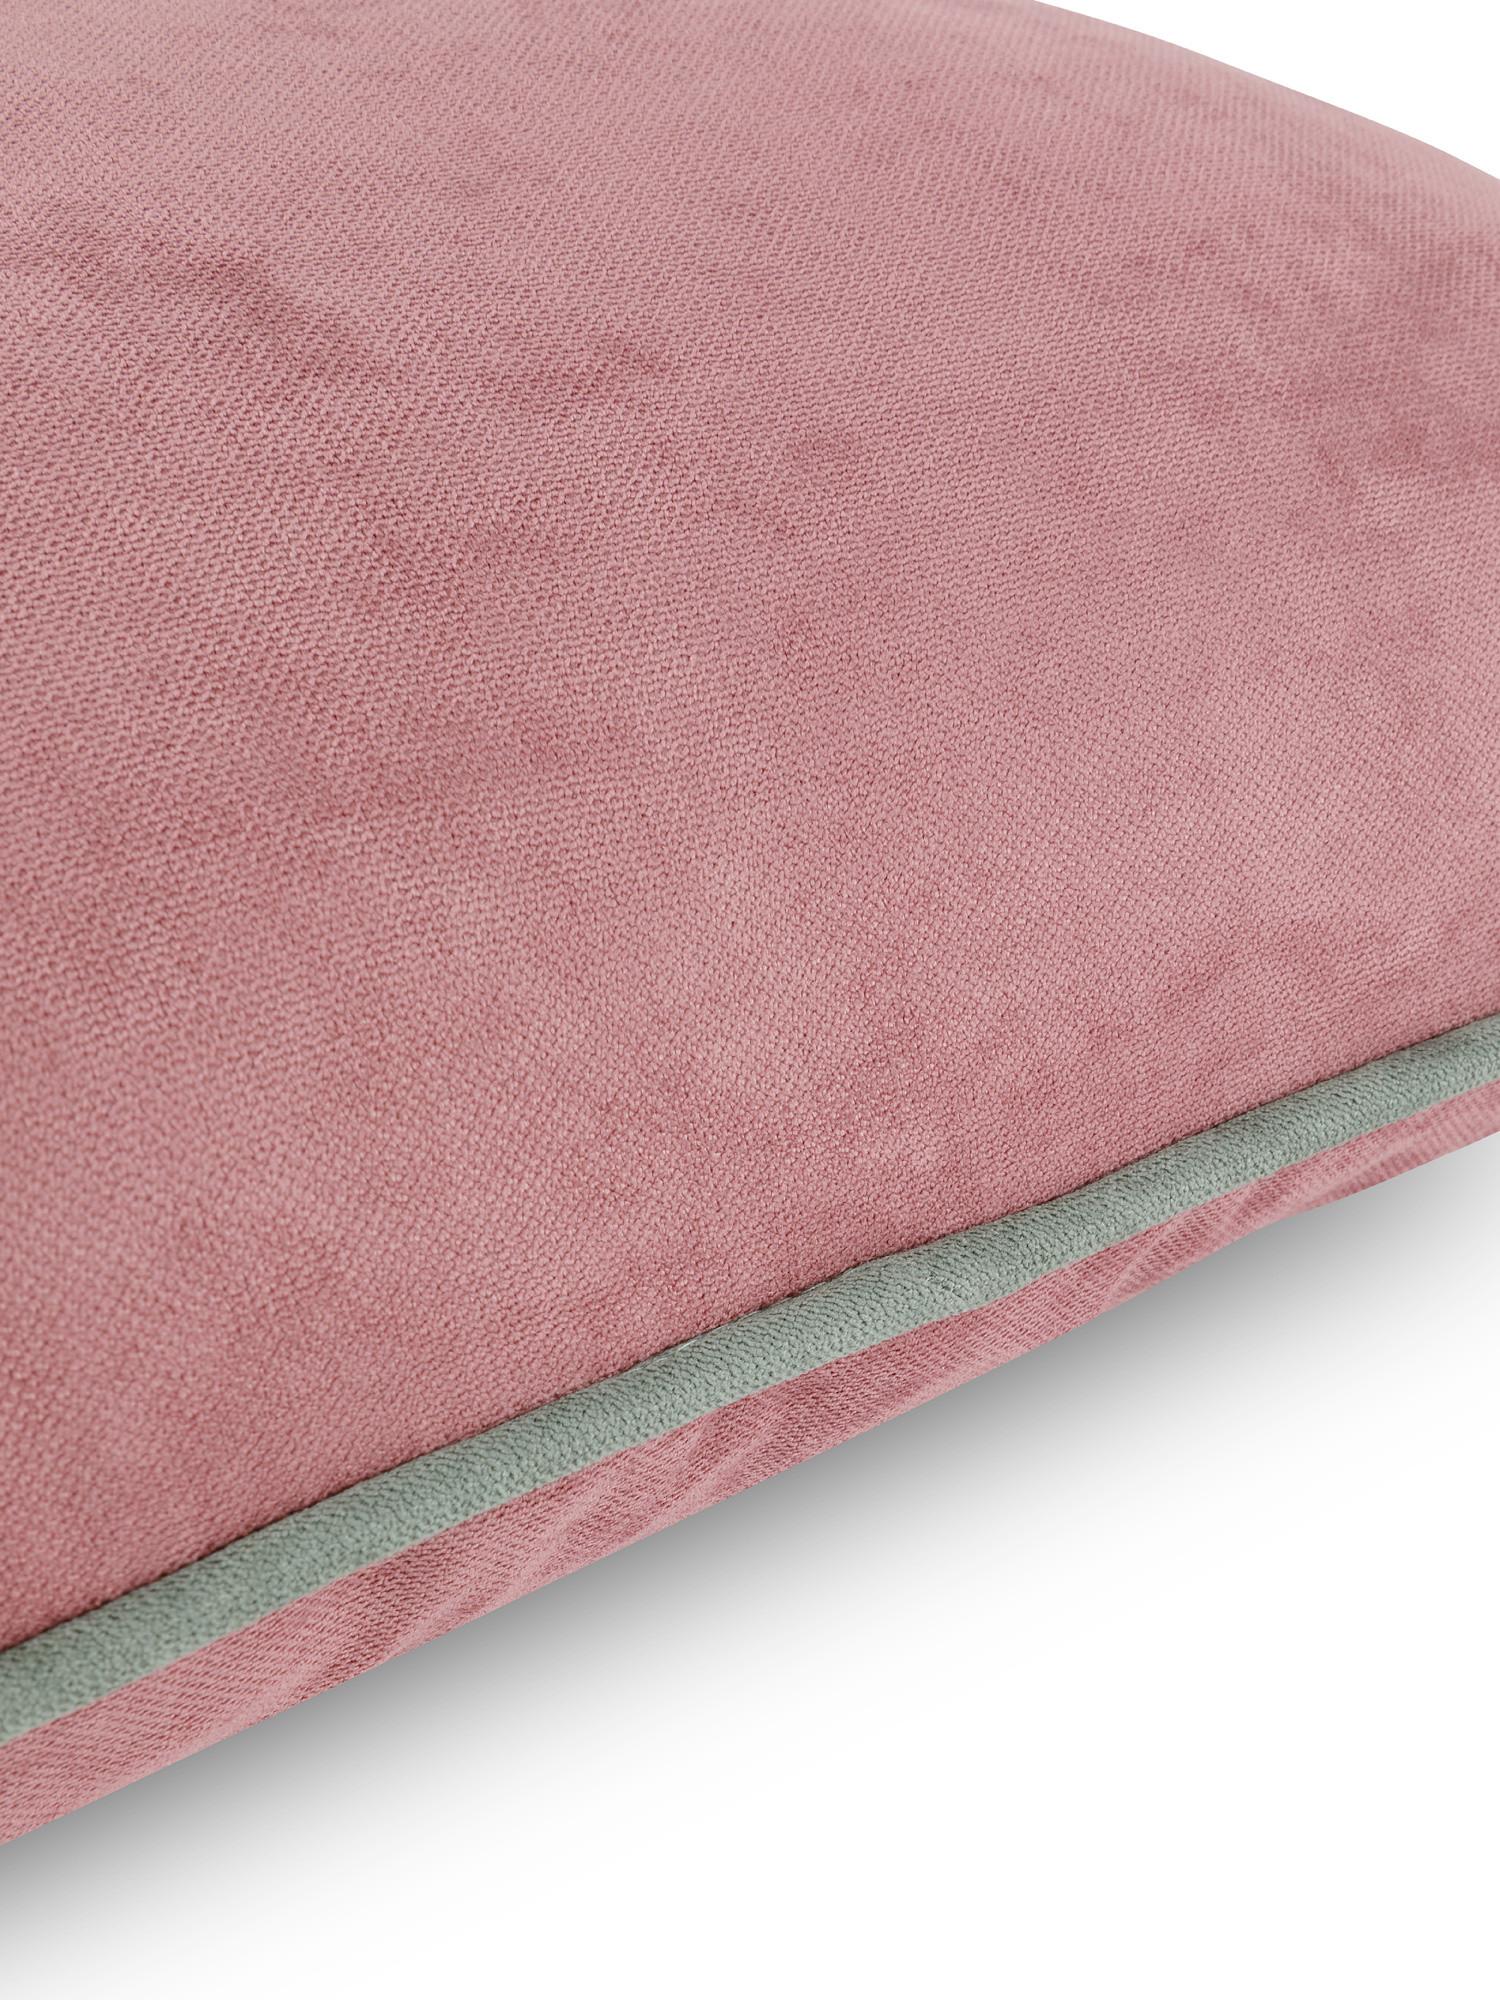 Cuscino tessuto effetto mélange 50x50cm, Rosa, large image number 2